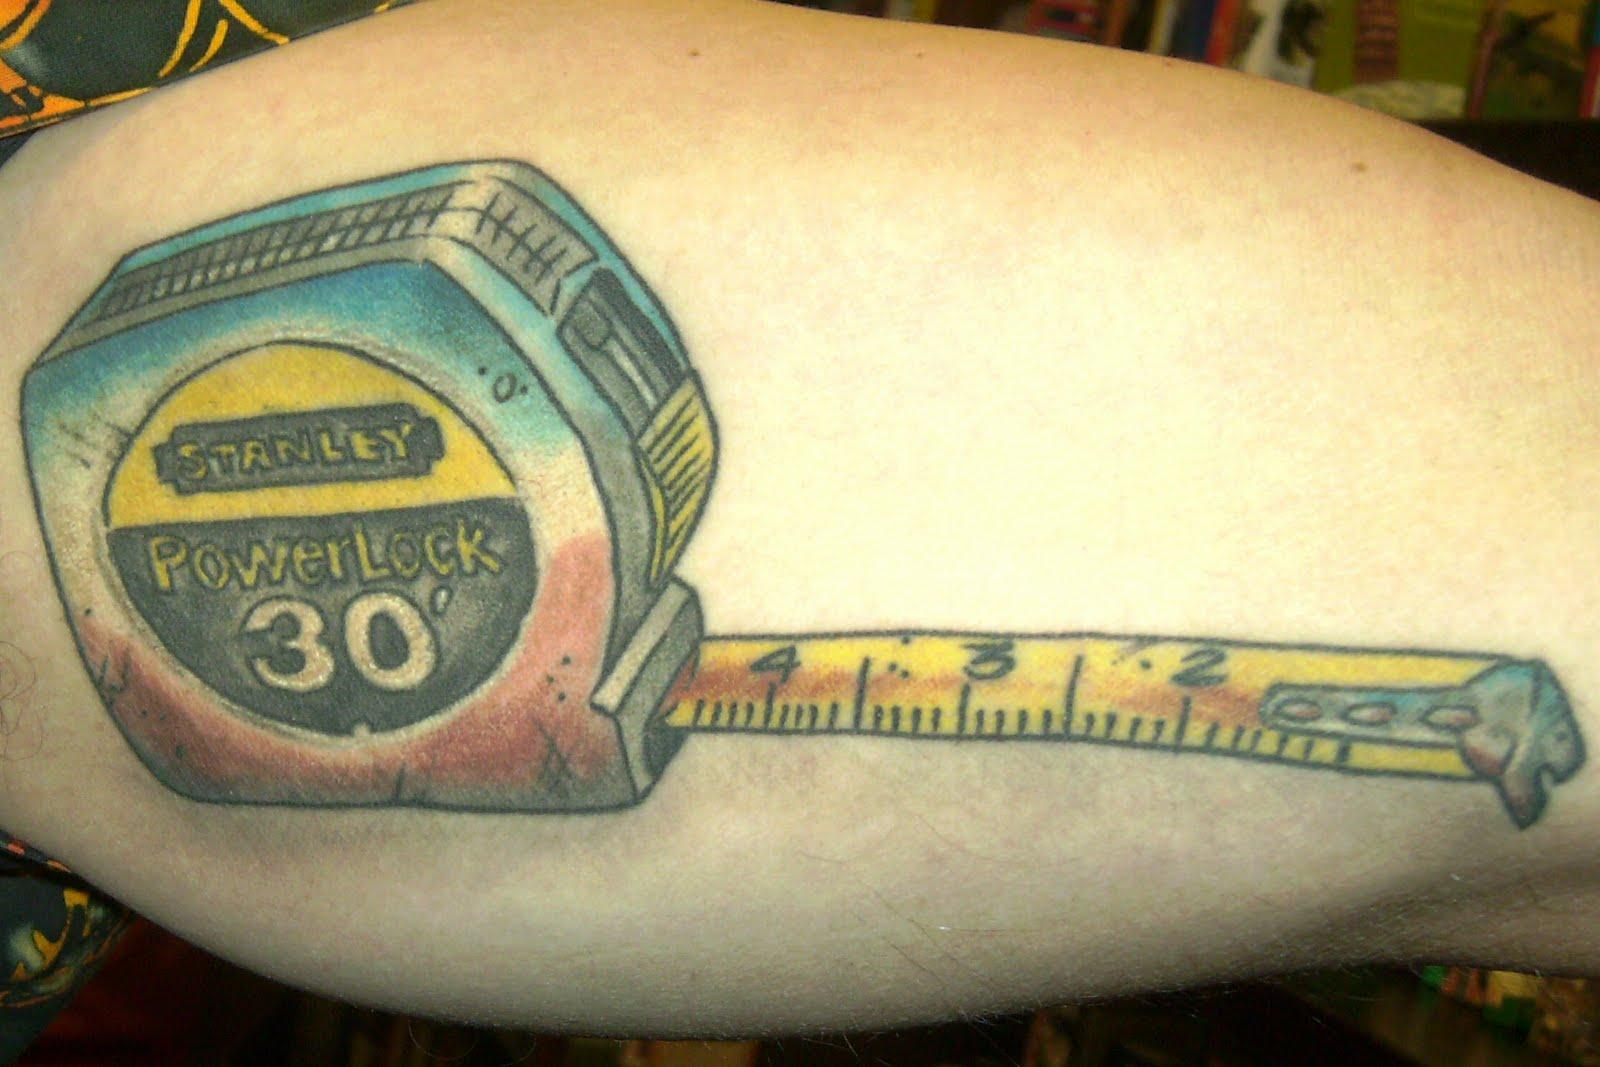 bb8975814 Tattoosday (A Tattoo Blog): Tattoosday Goes to Hawai'i: Scott Shares ...